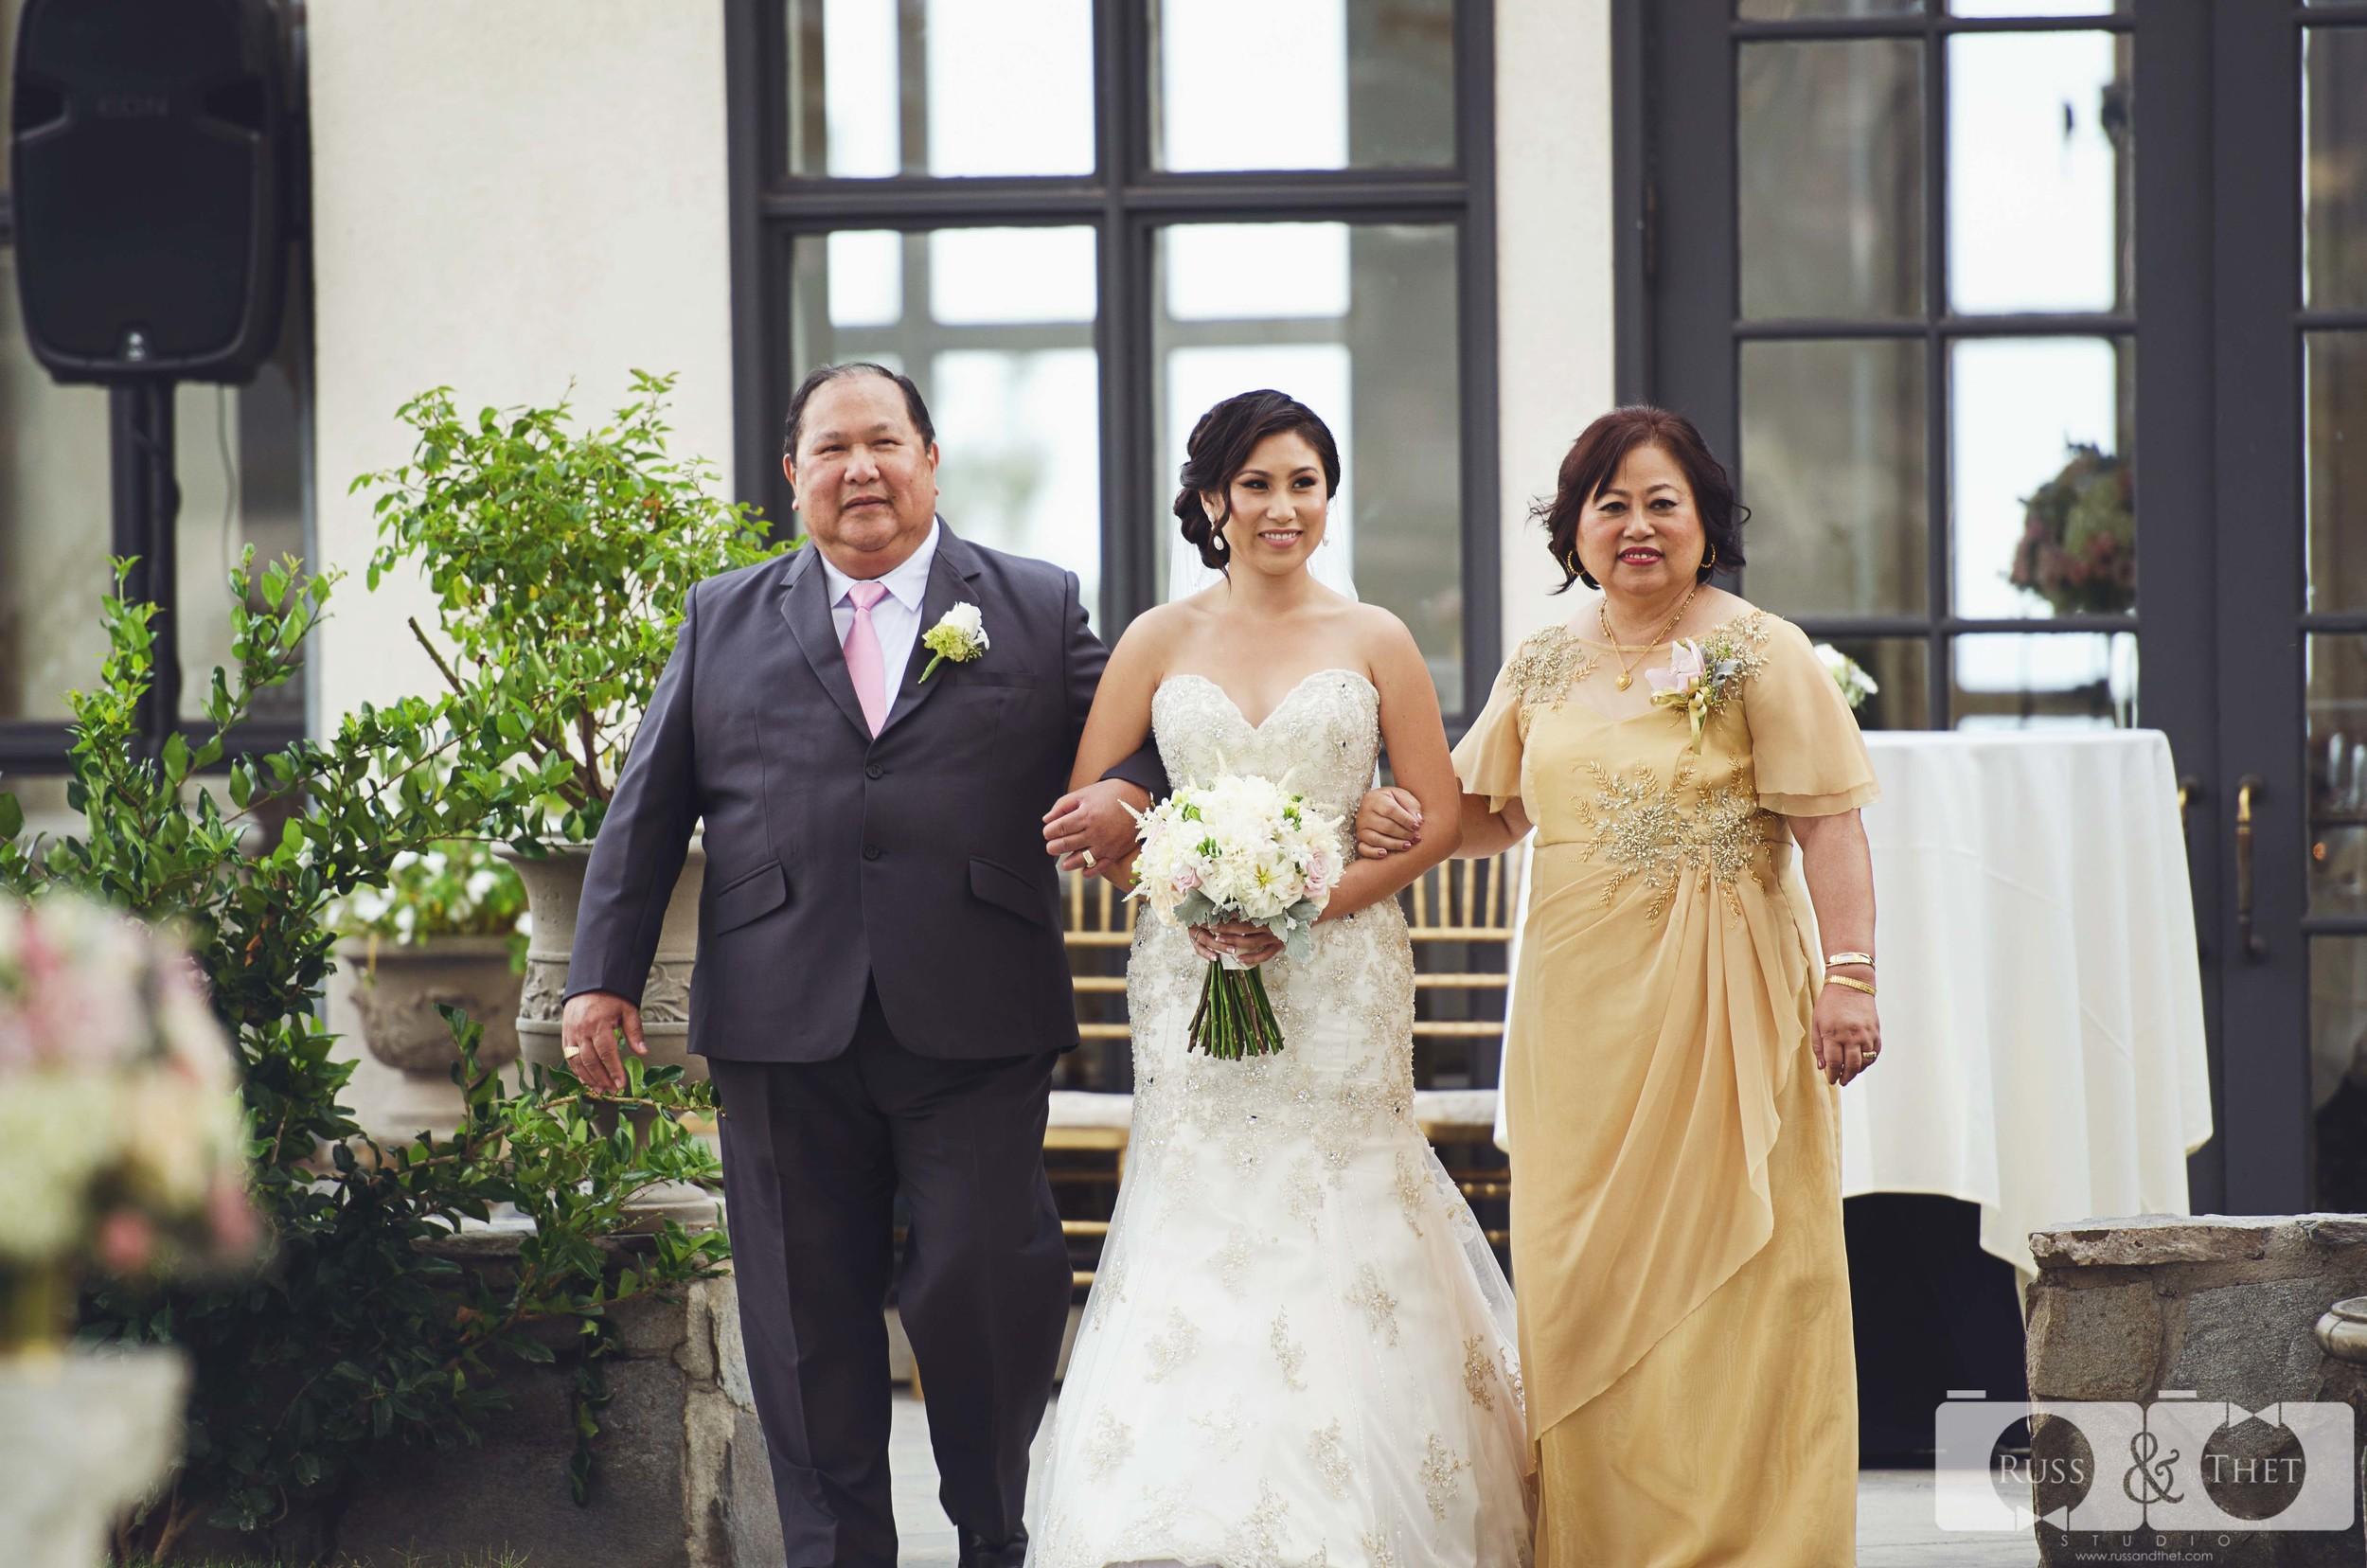 summit-house-fullerton-wedding-photographer-7.JPG